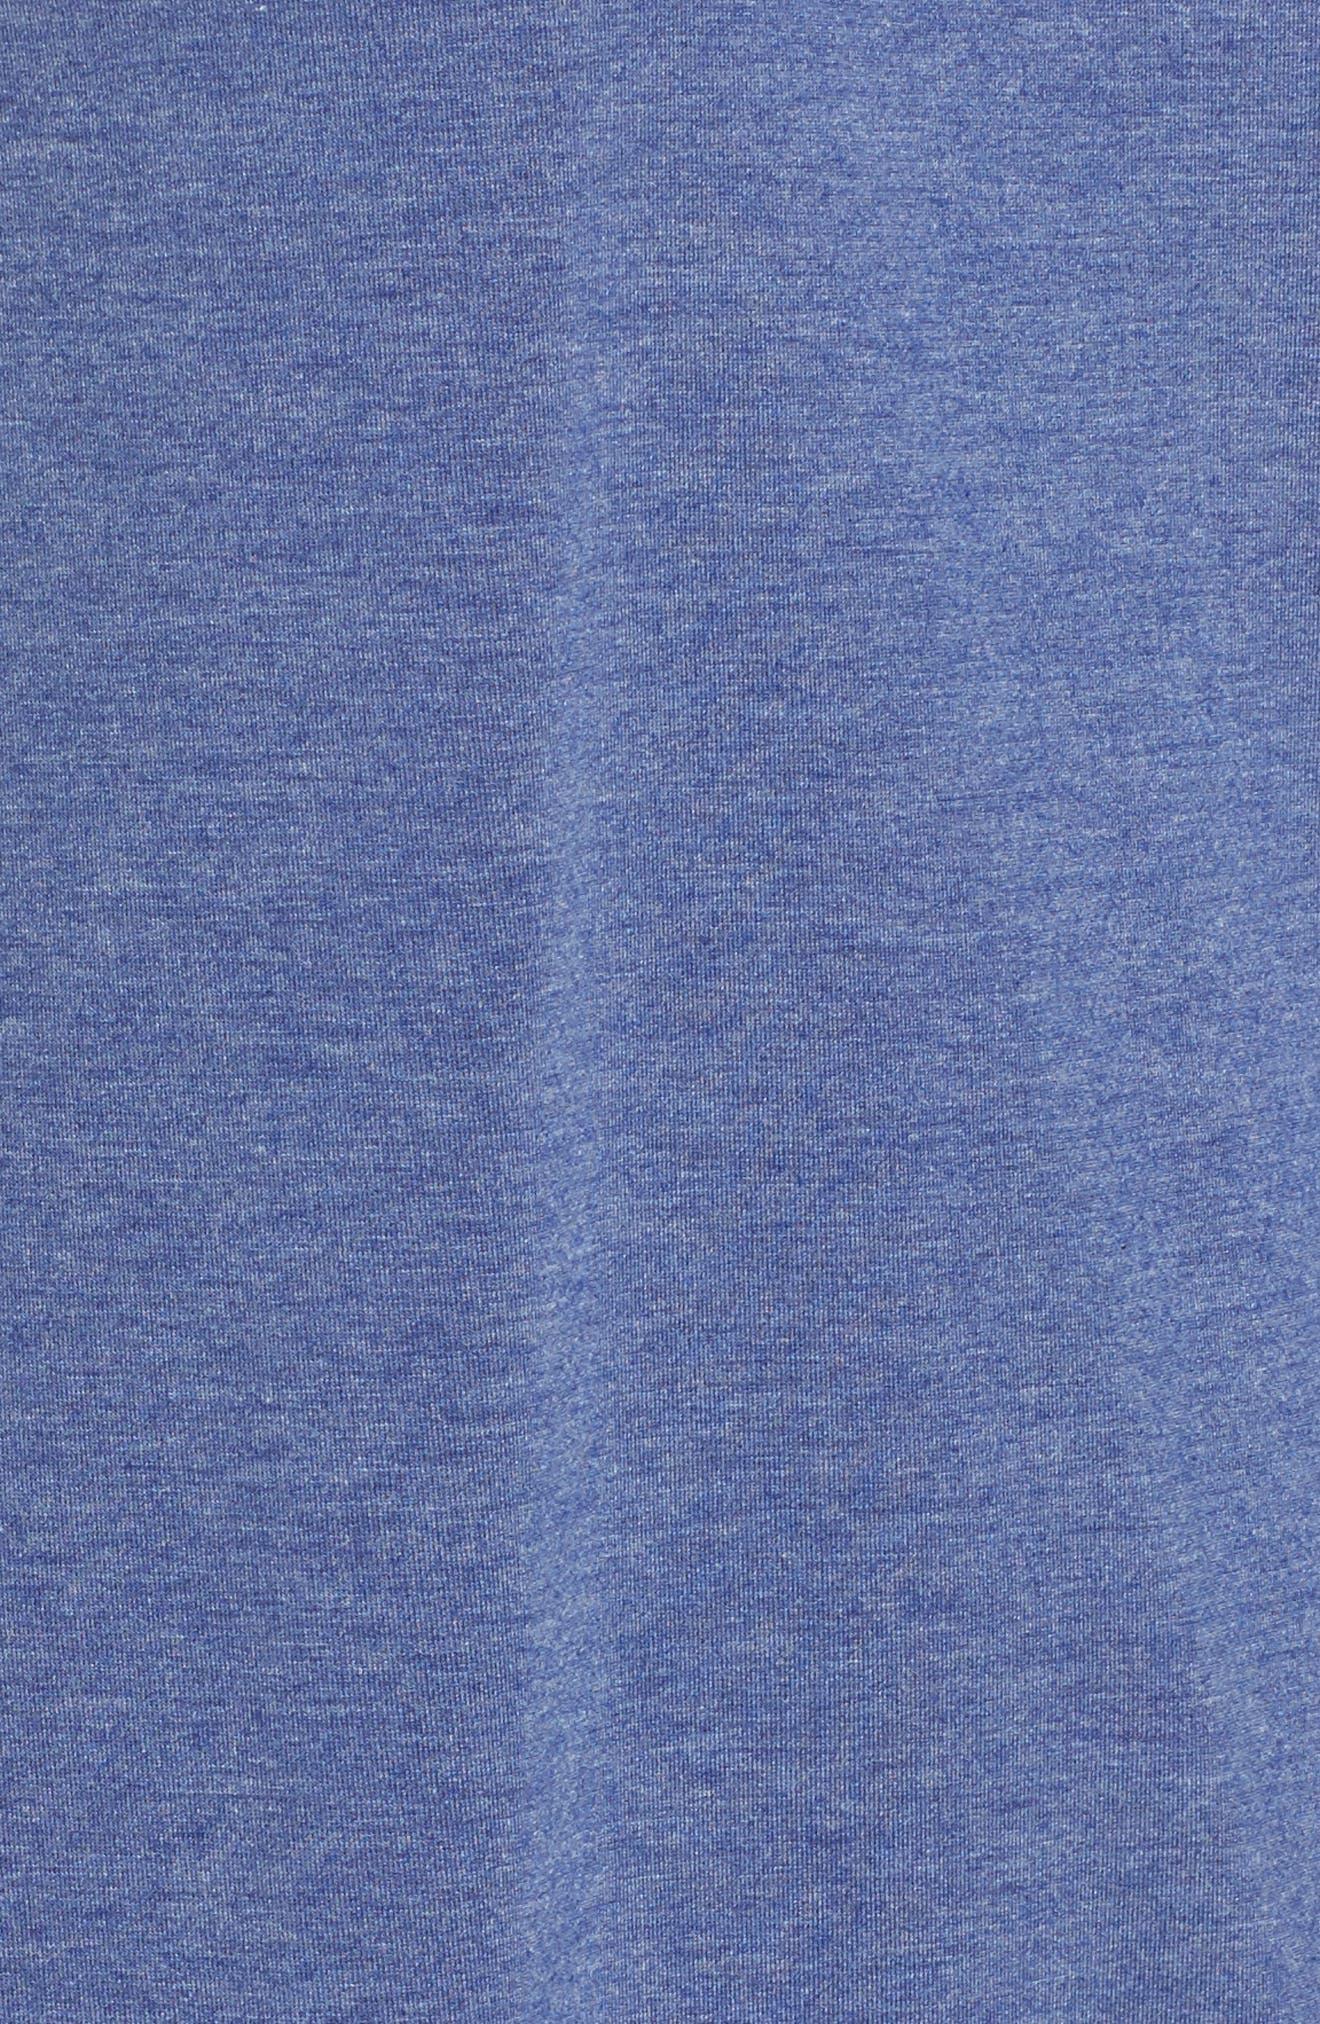 Honeydew All American Sleep Shirt,                             Alternate thumbnail 5, color,                             Dream